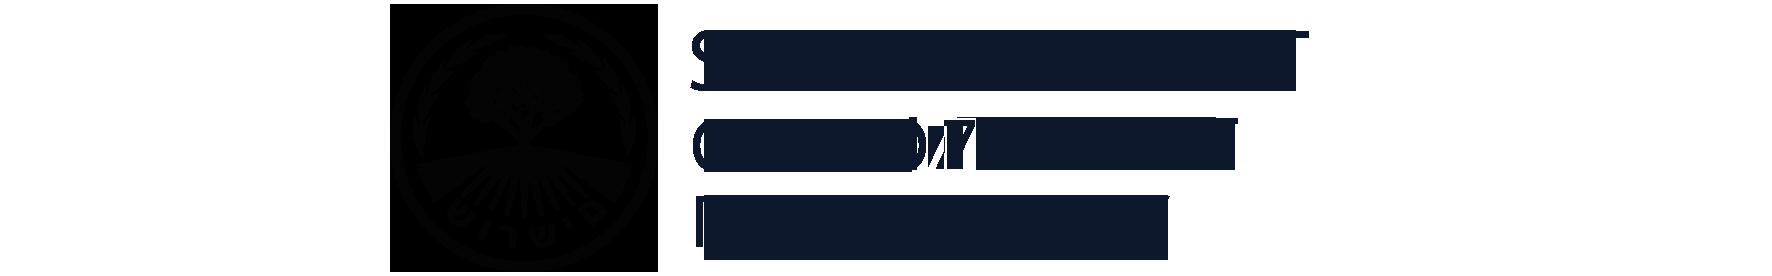 SHOROSHIM